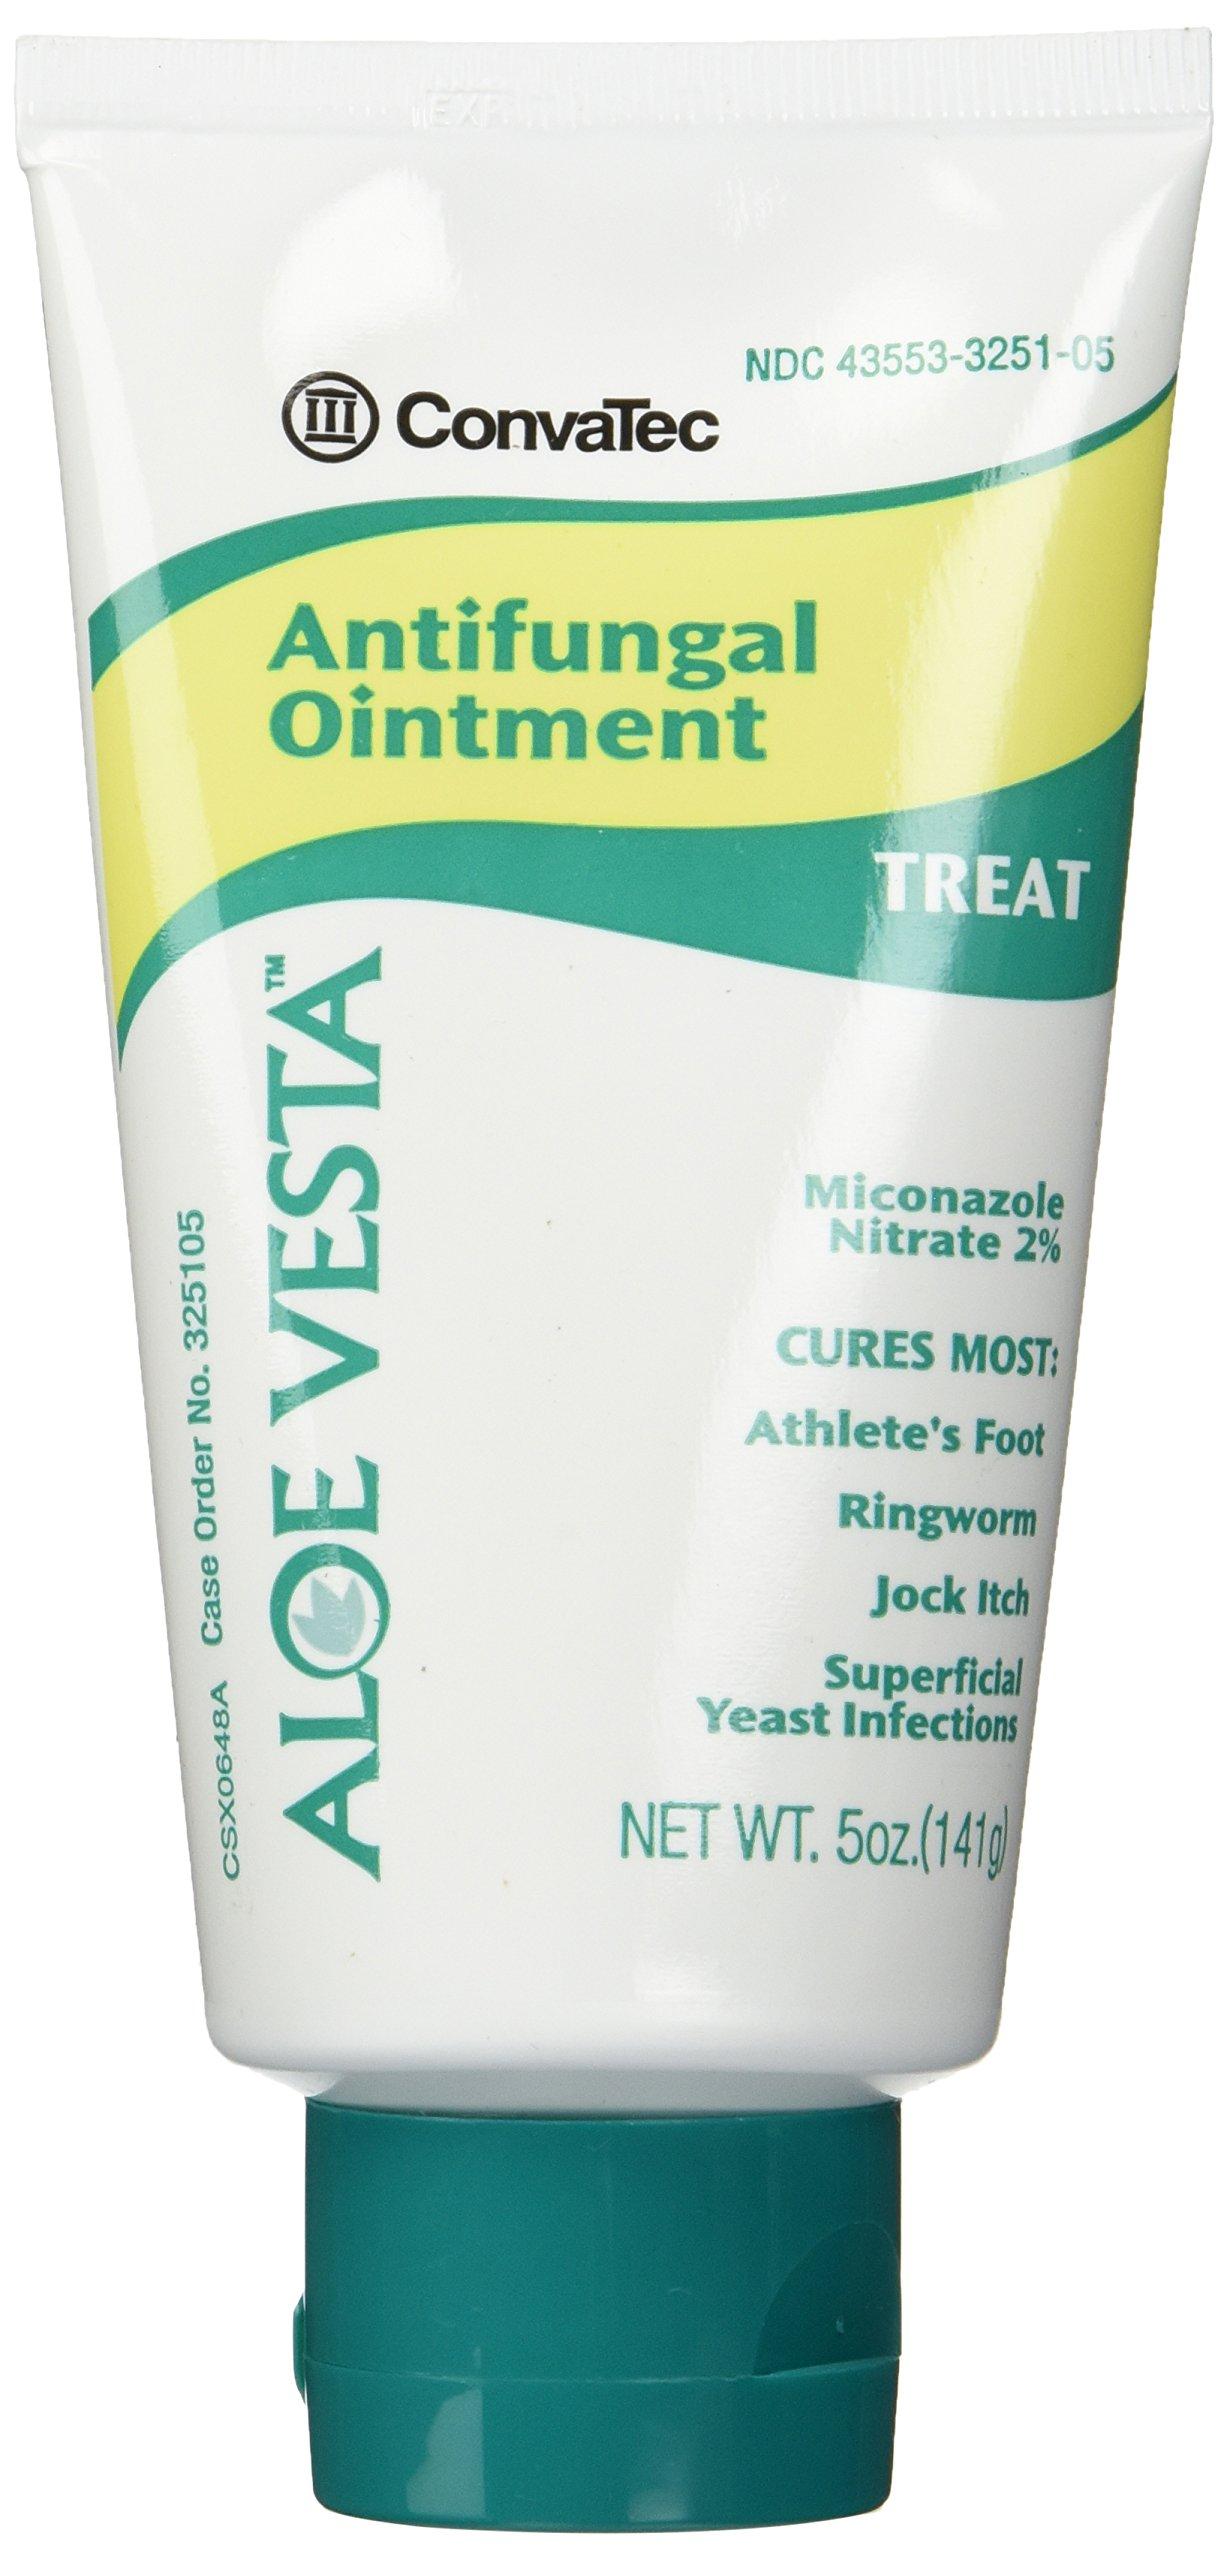 Aloe Vesta Antifungal Ointment, 5 oz. Tube